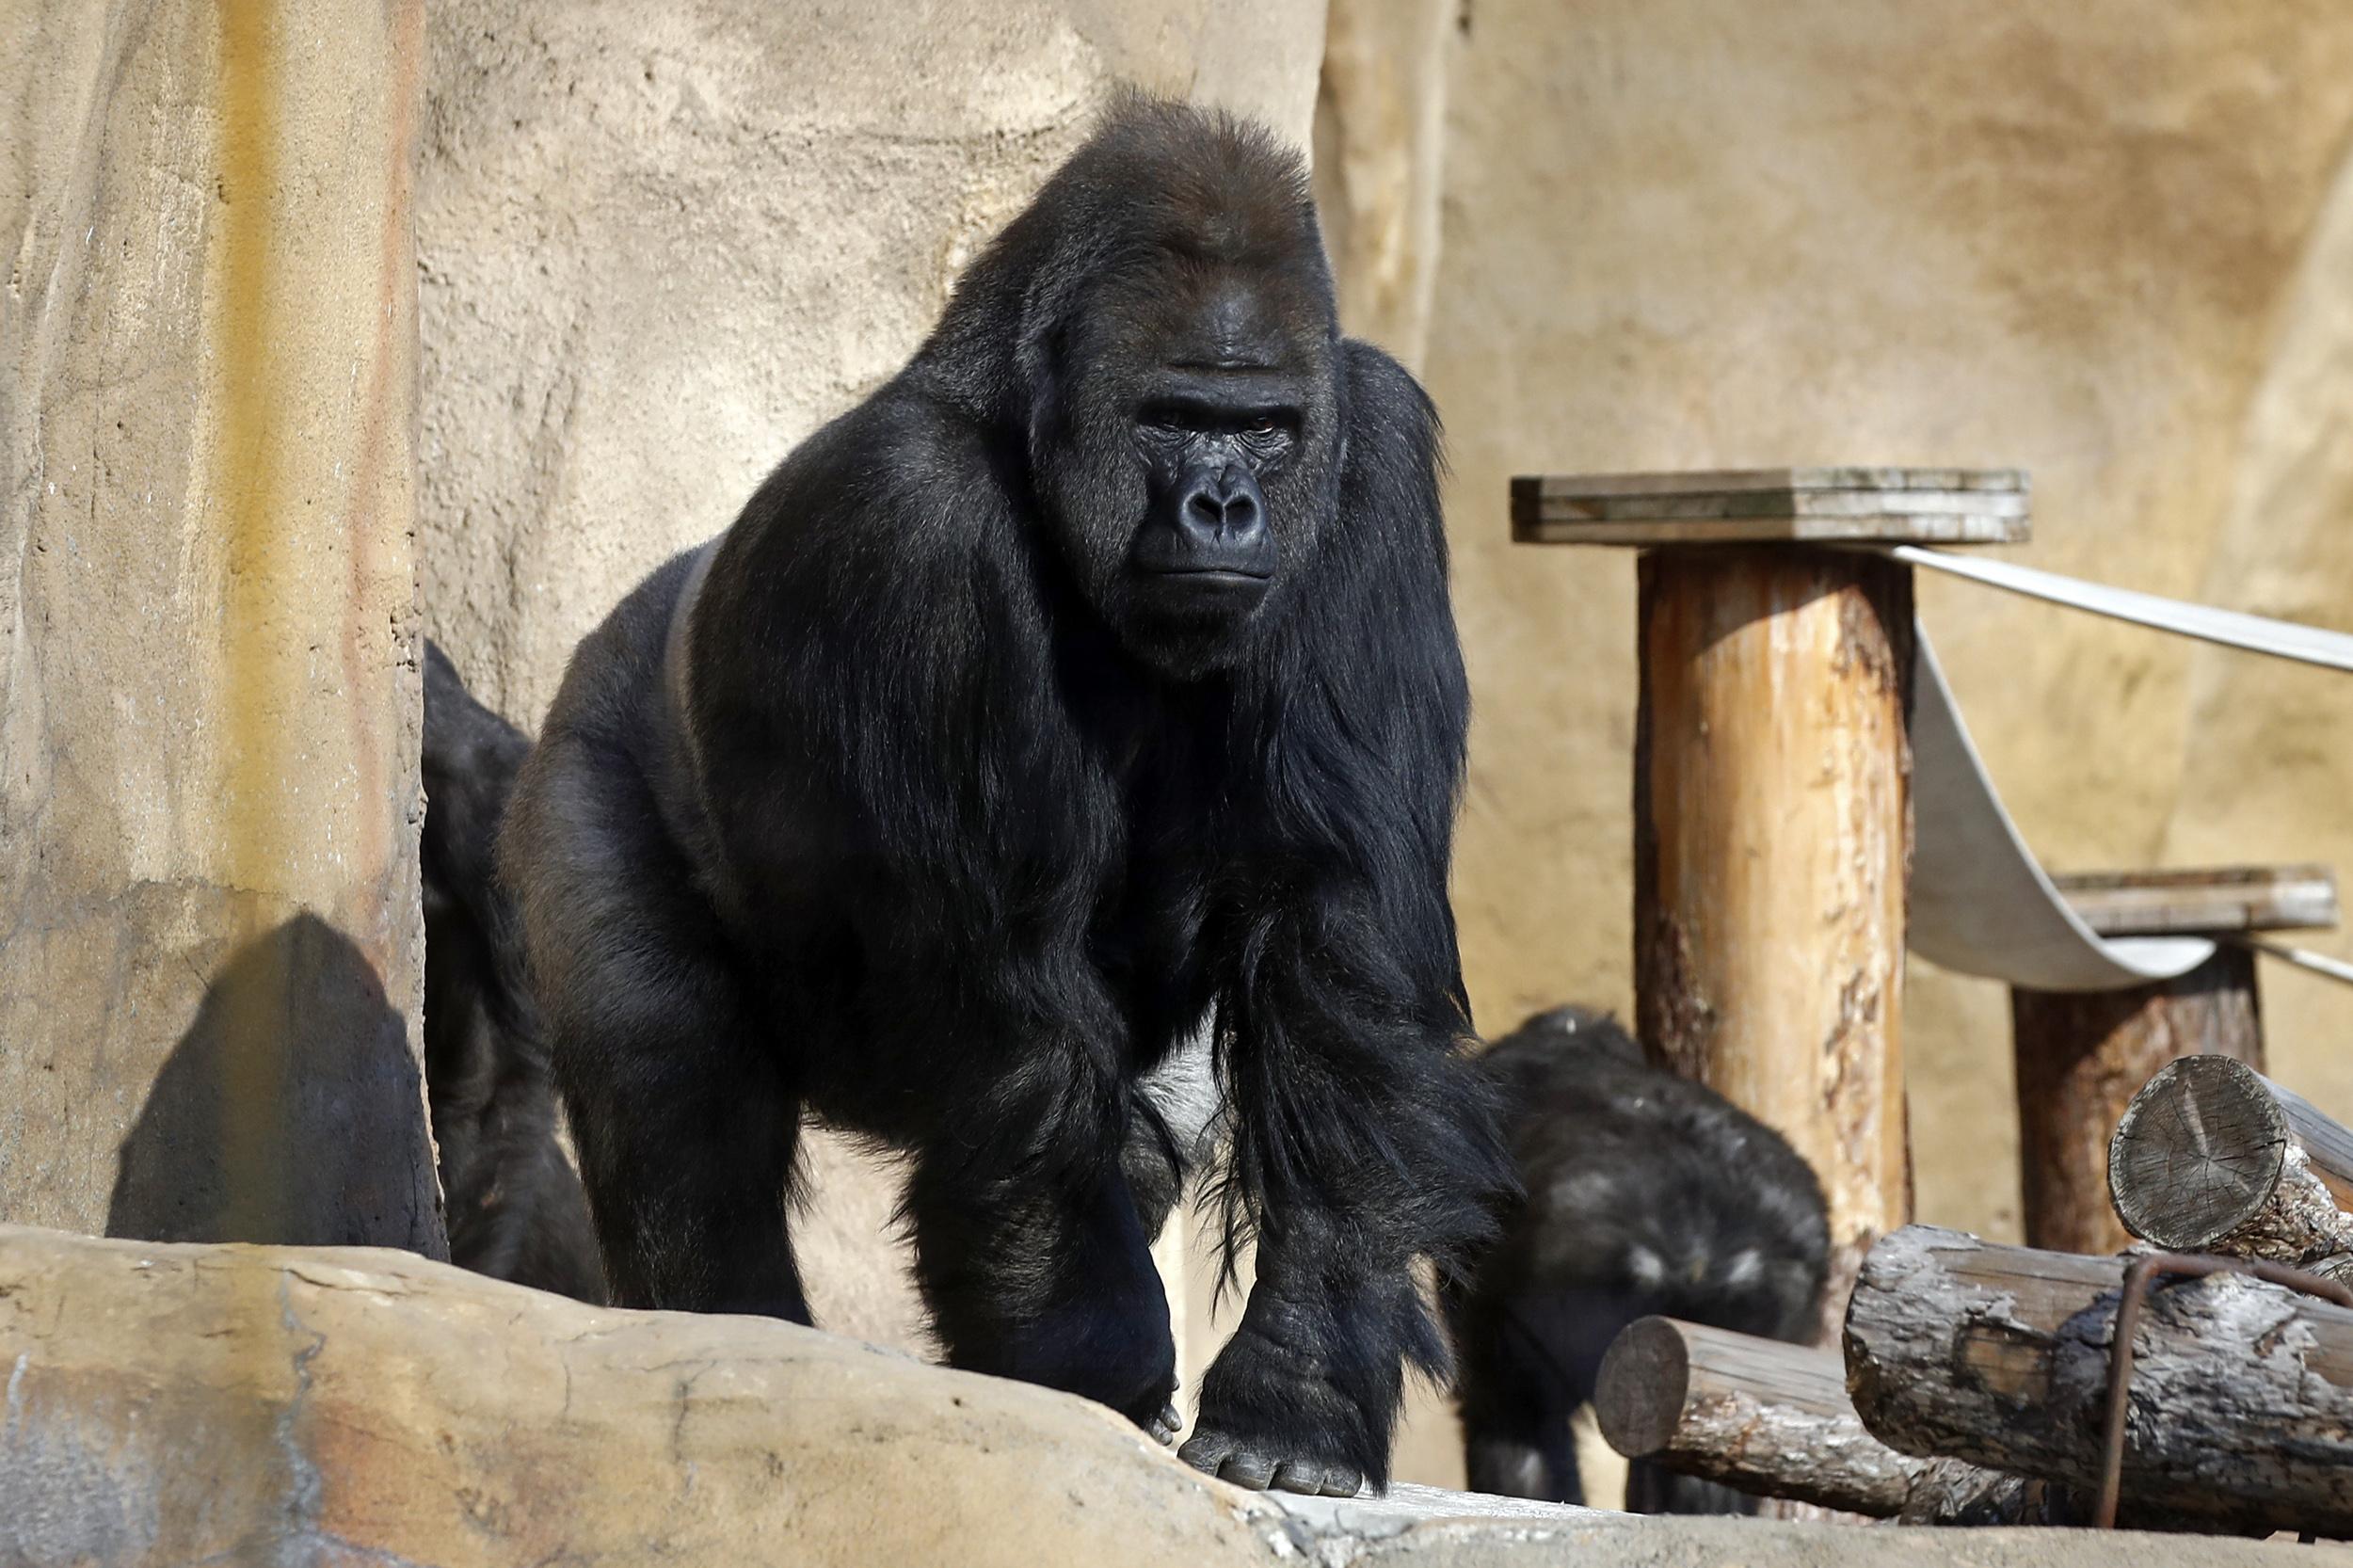 Gorillas at Zoo Atlanta test positive for Covid